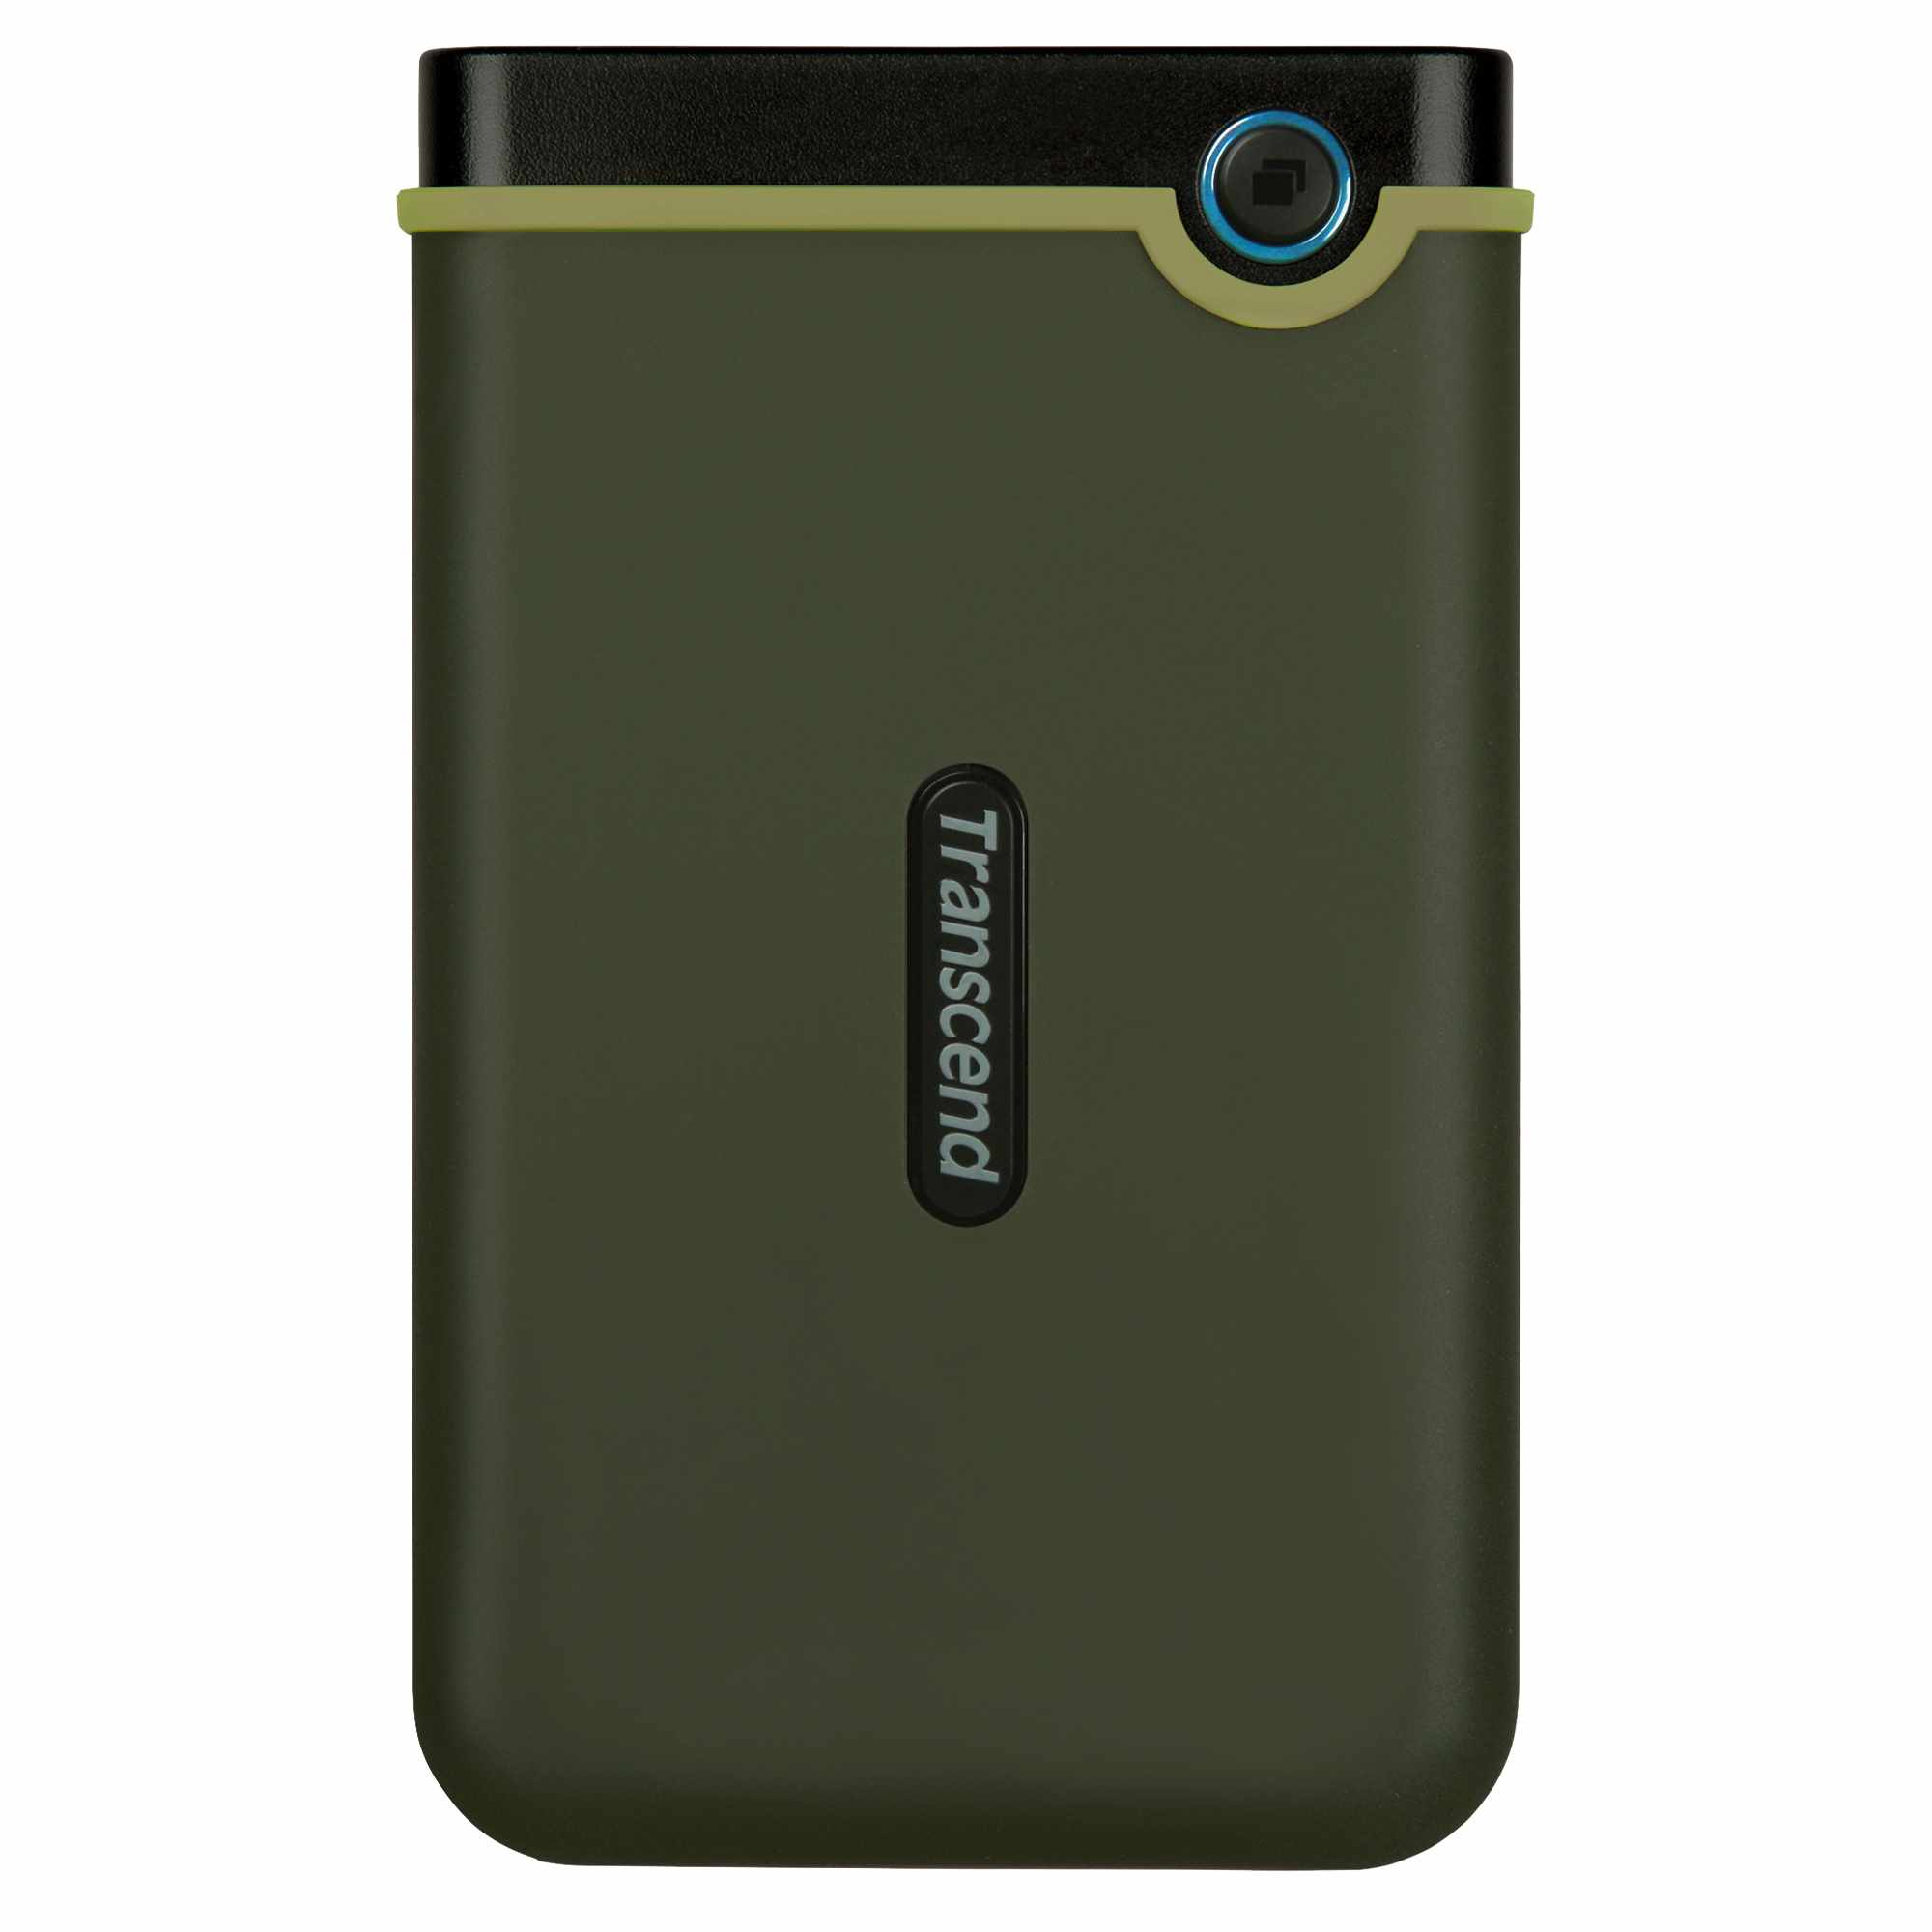 "TRANSCEND externí HDD 2,5"" USB 3.0 StoreJet 25M3G, Slim, 2TB, Black (SATA, Rubber Case, Anti-Sh"